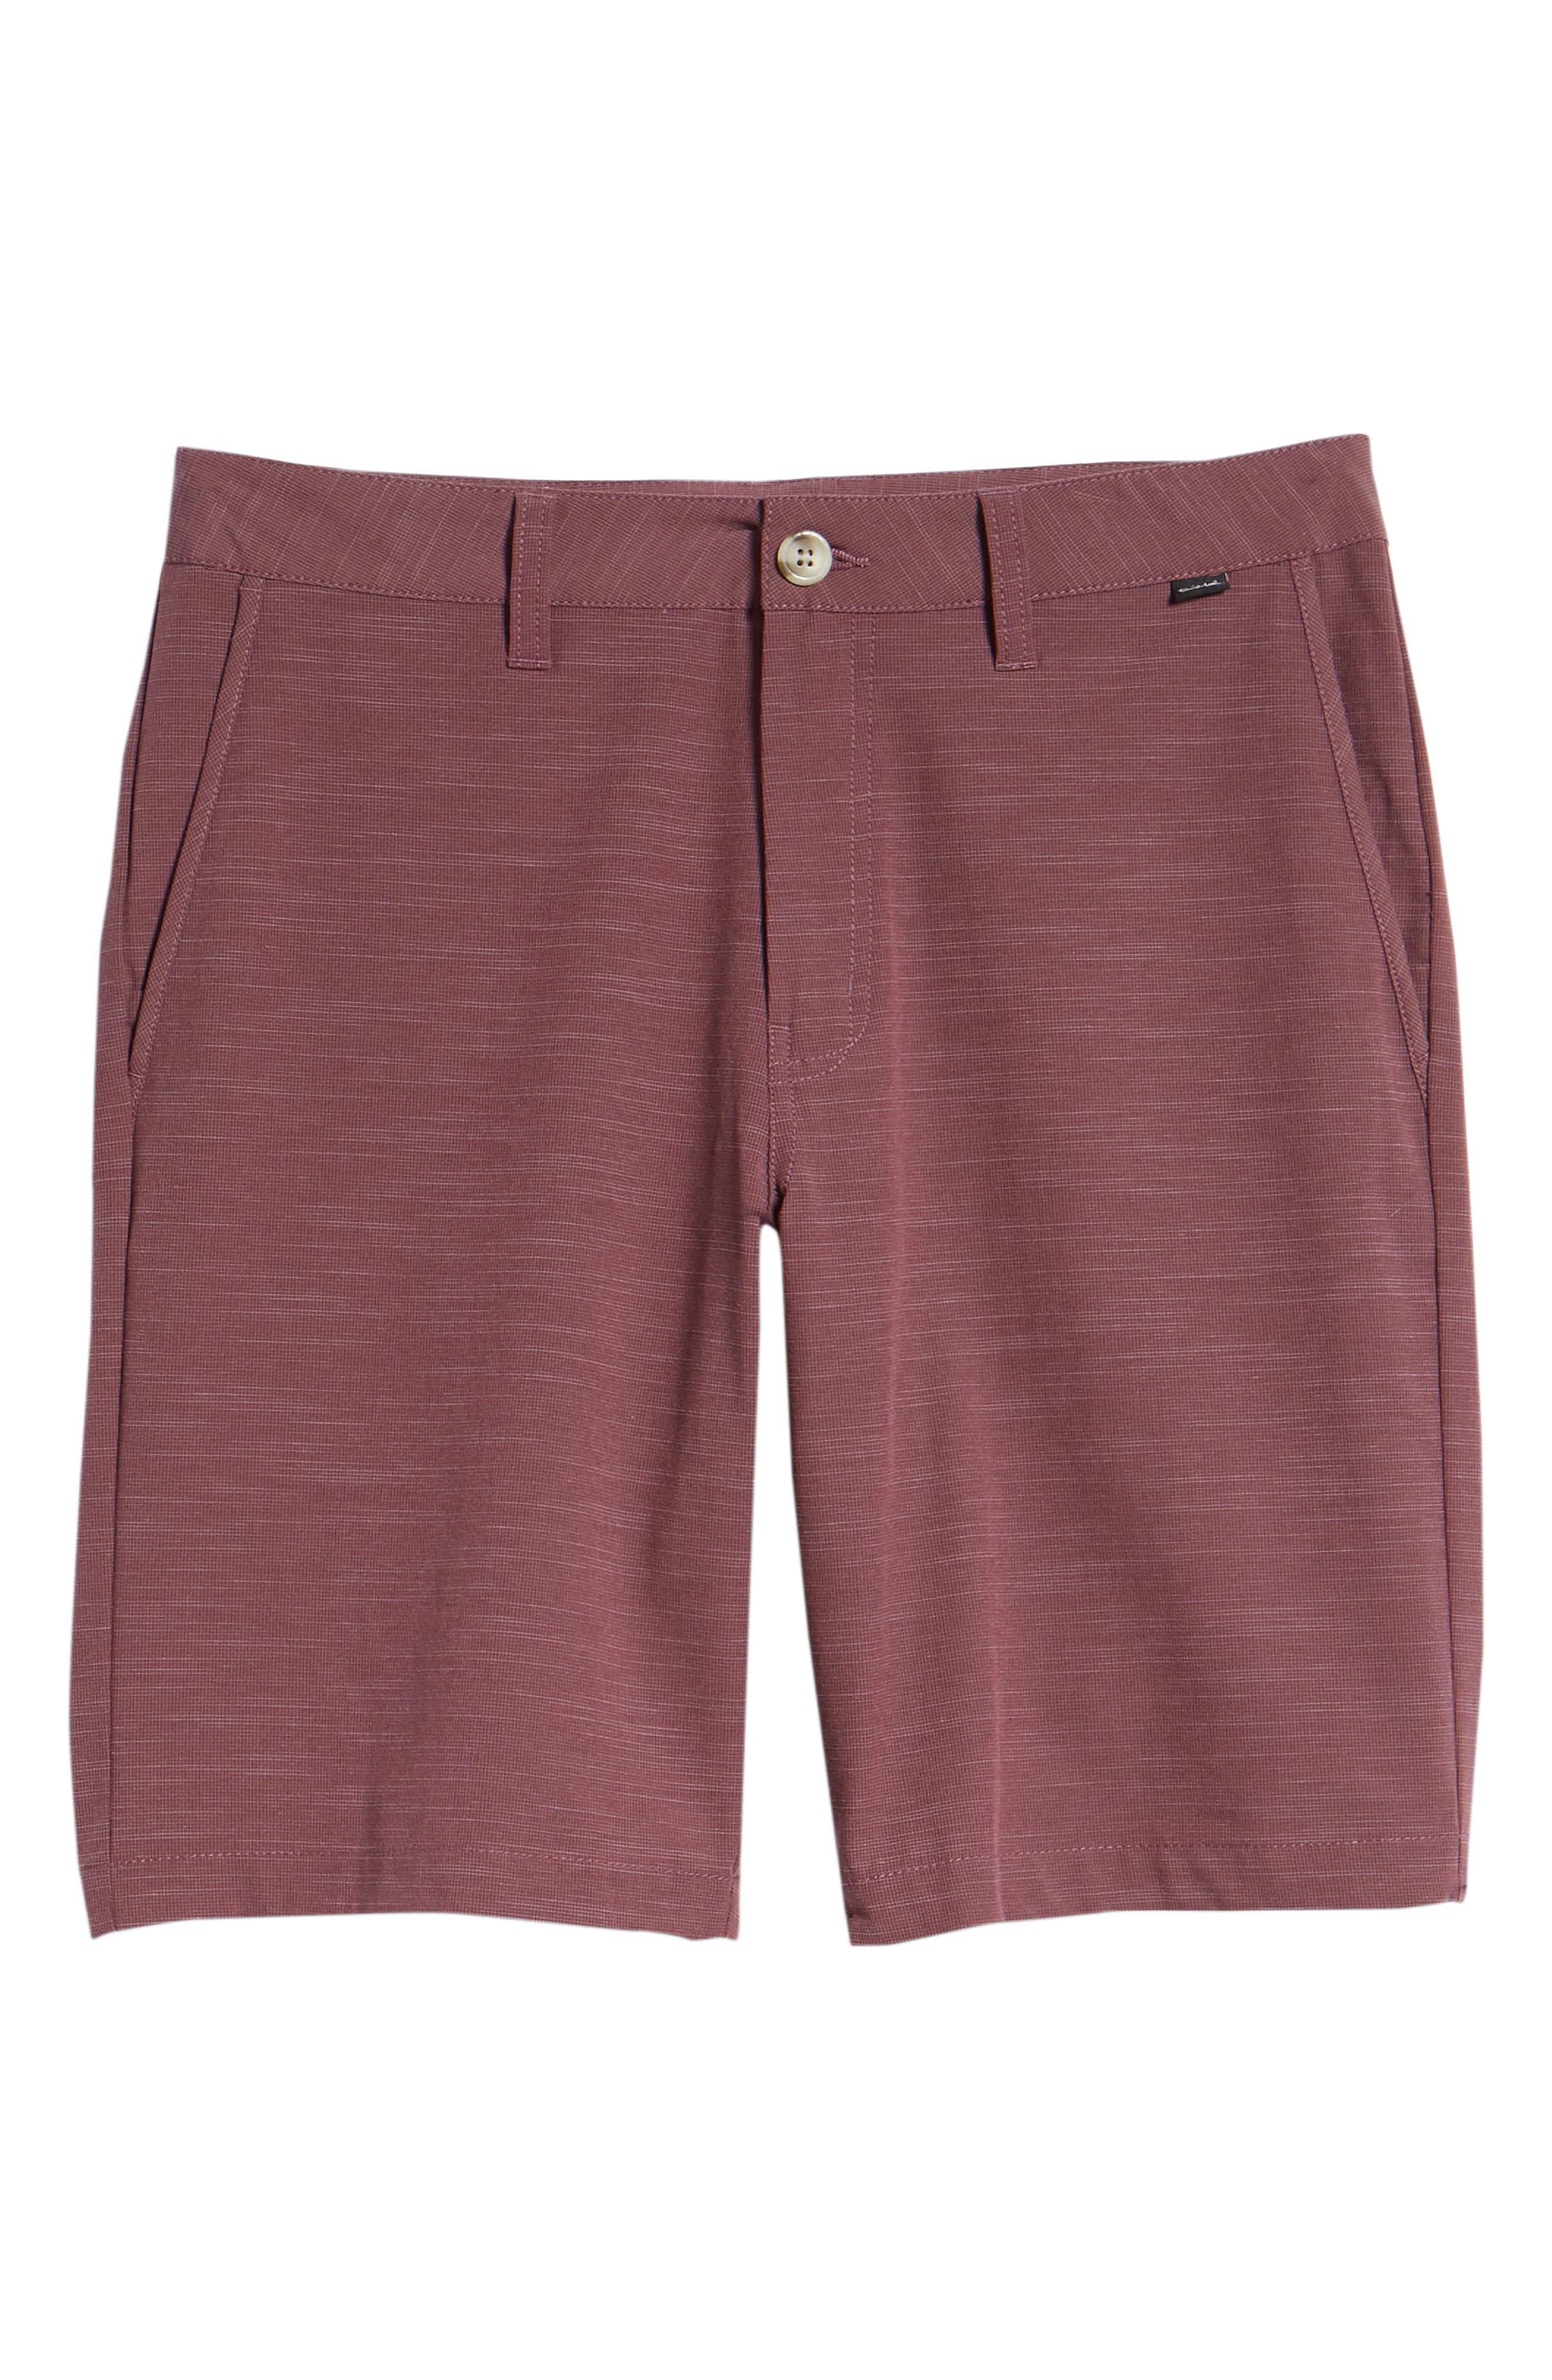 Tuner Shorts,                             Alternate thumbnail 6, color,                             EGGPLANT